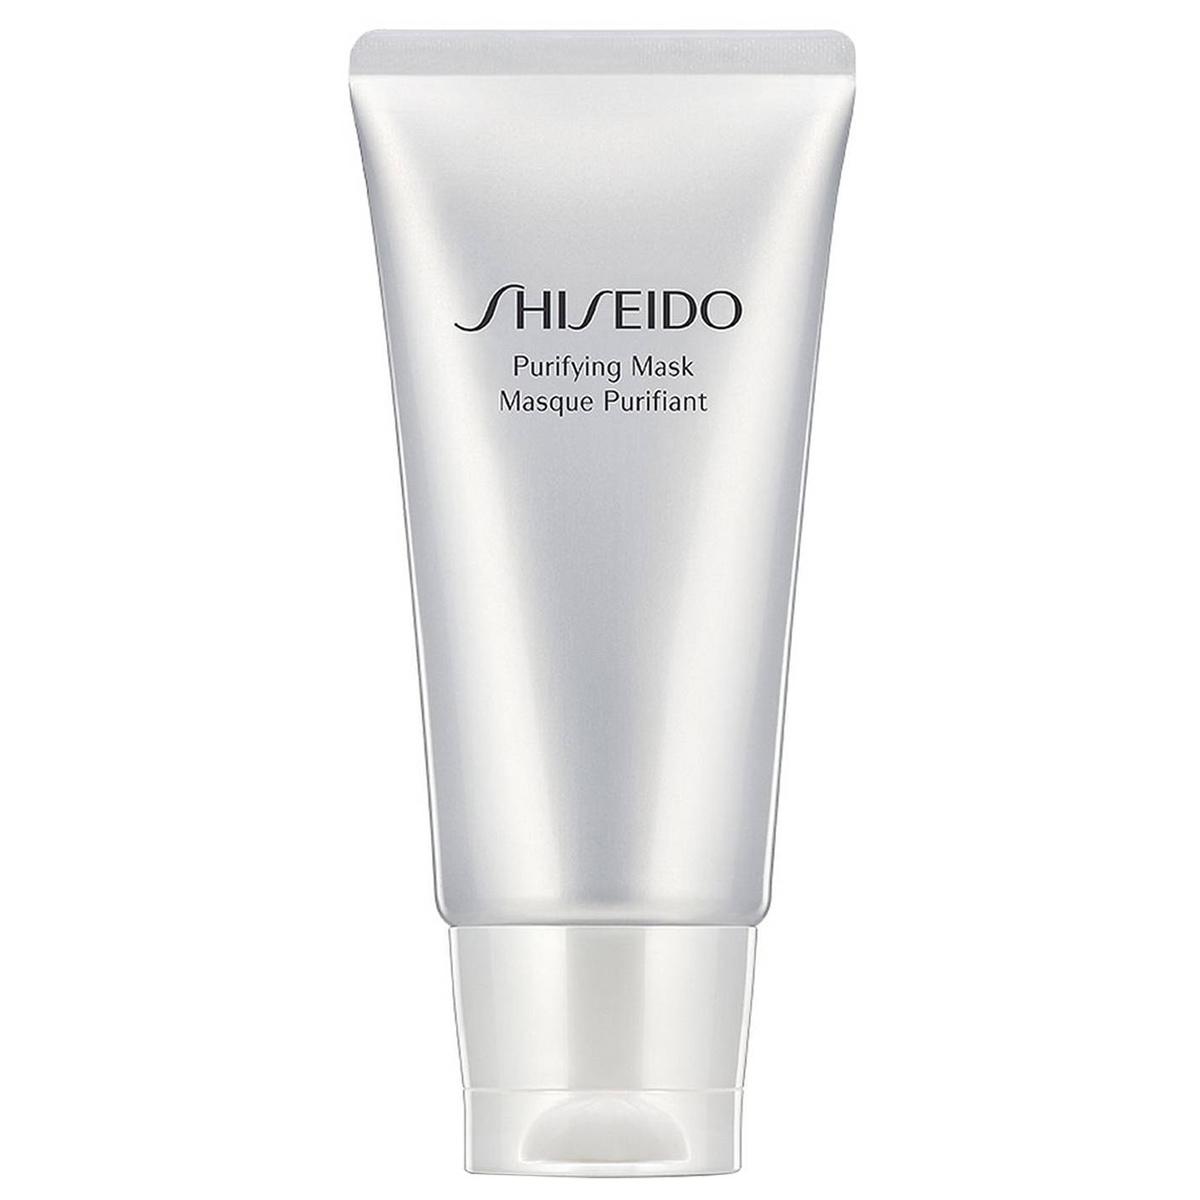 Shiseido - Masque Purifiant - 75 ml